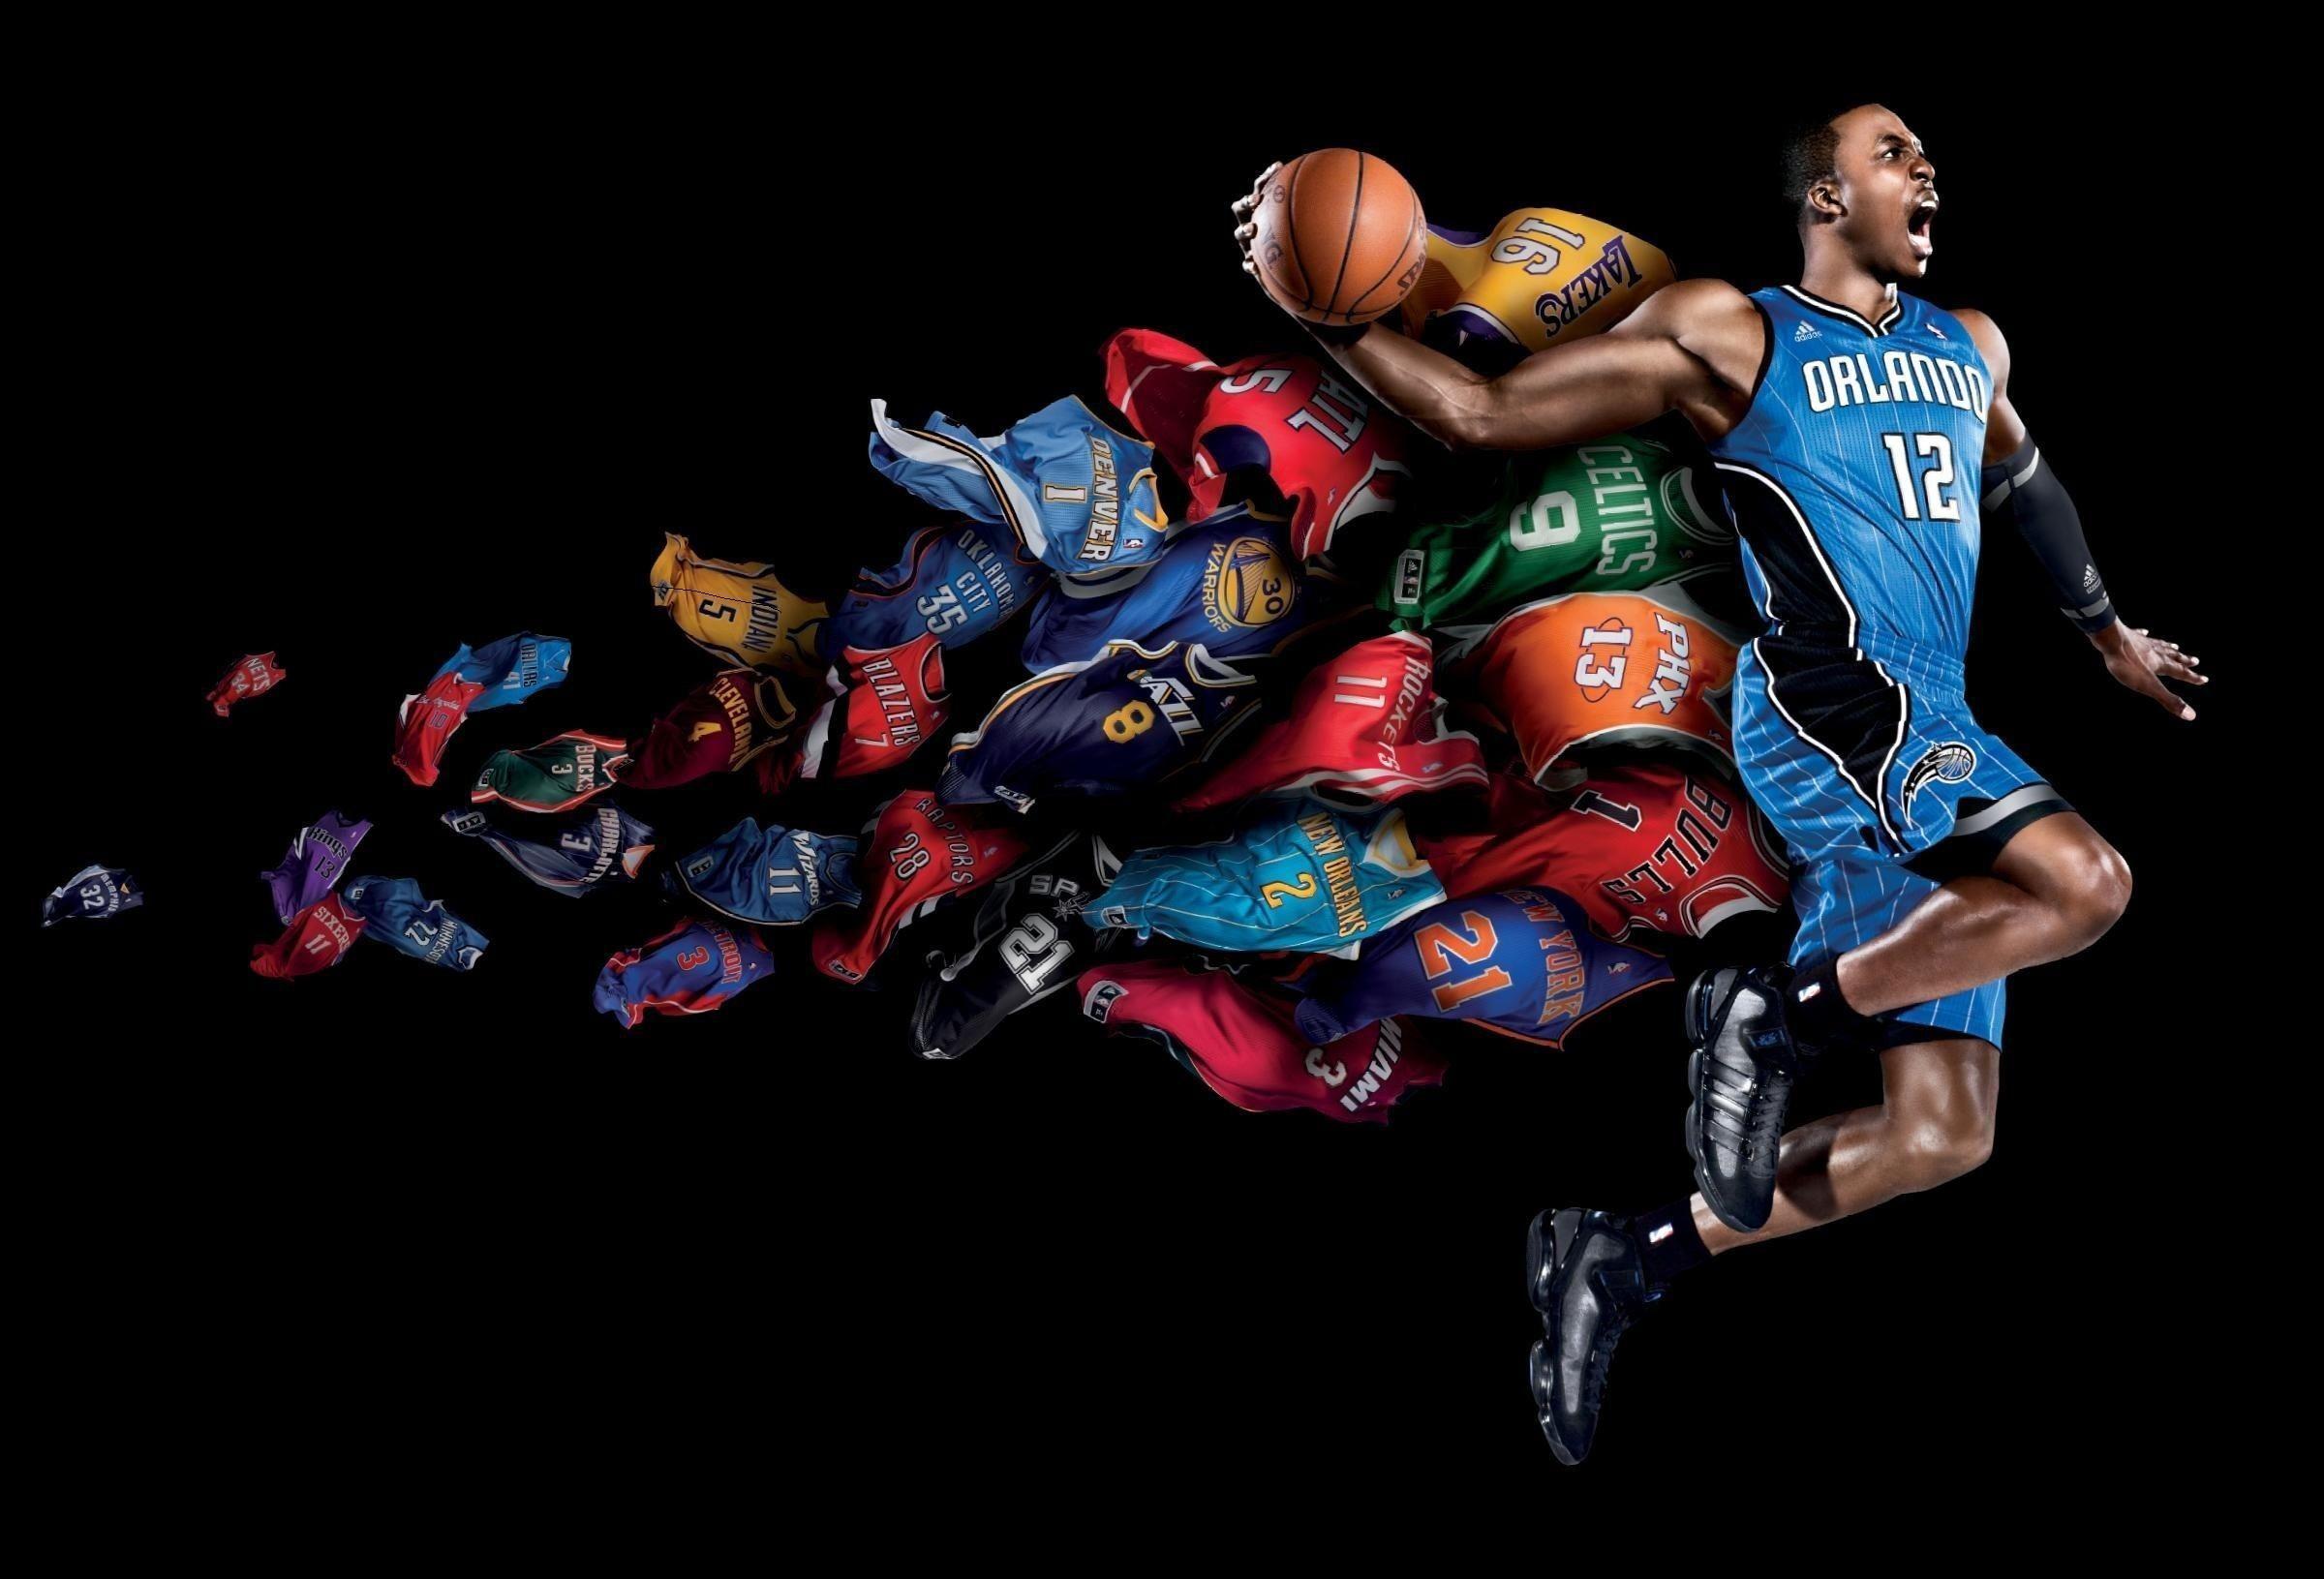 Cool Basketball Wallpapers Group 79 2400x1631